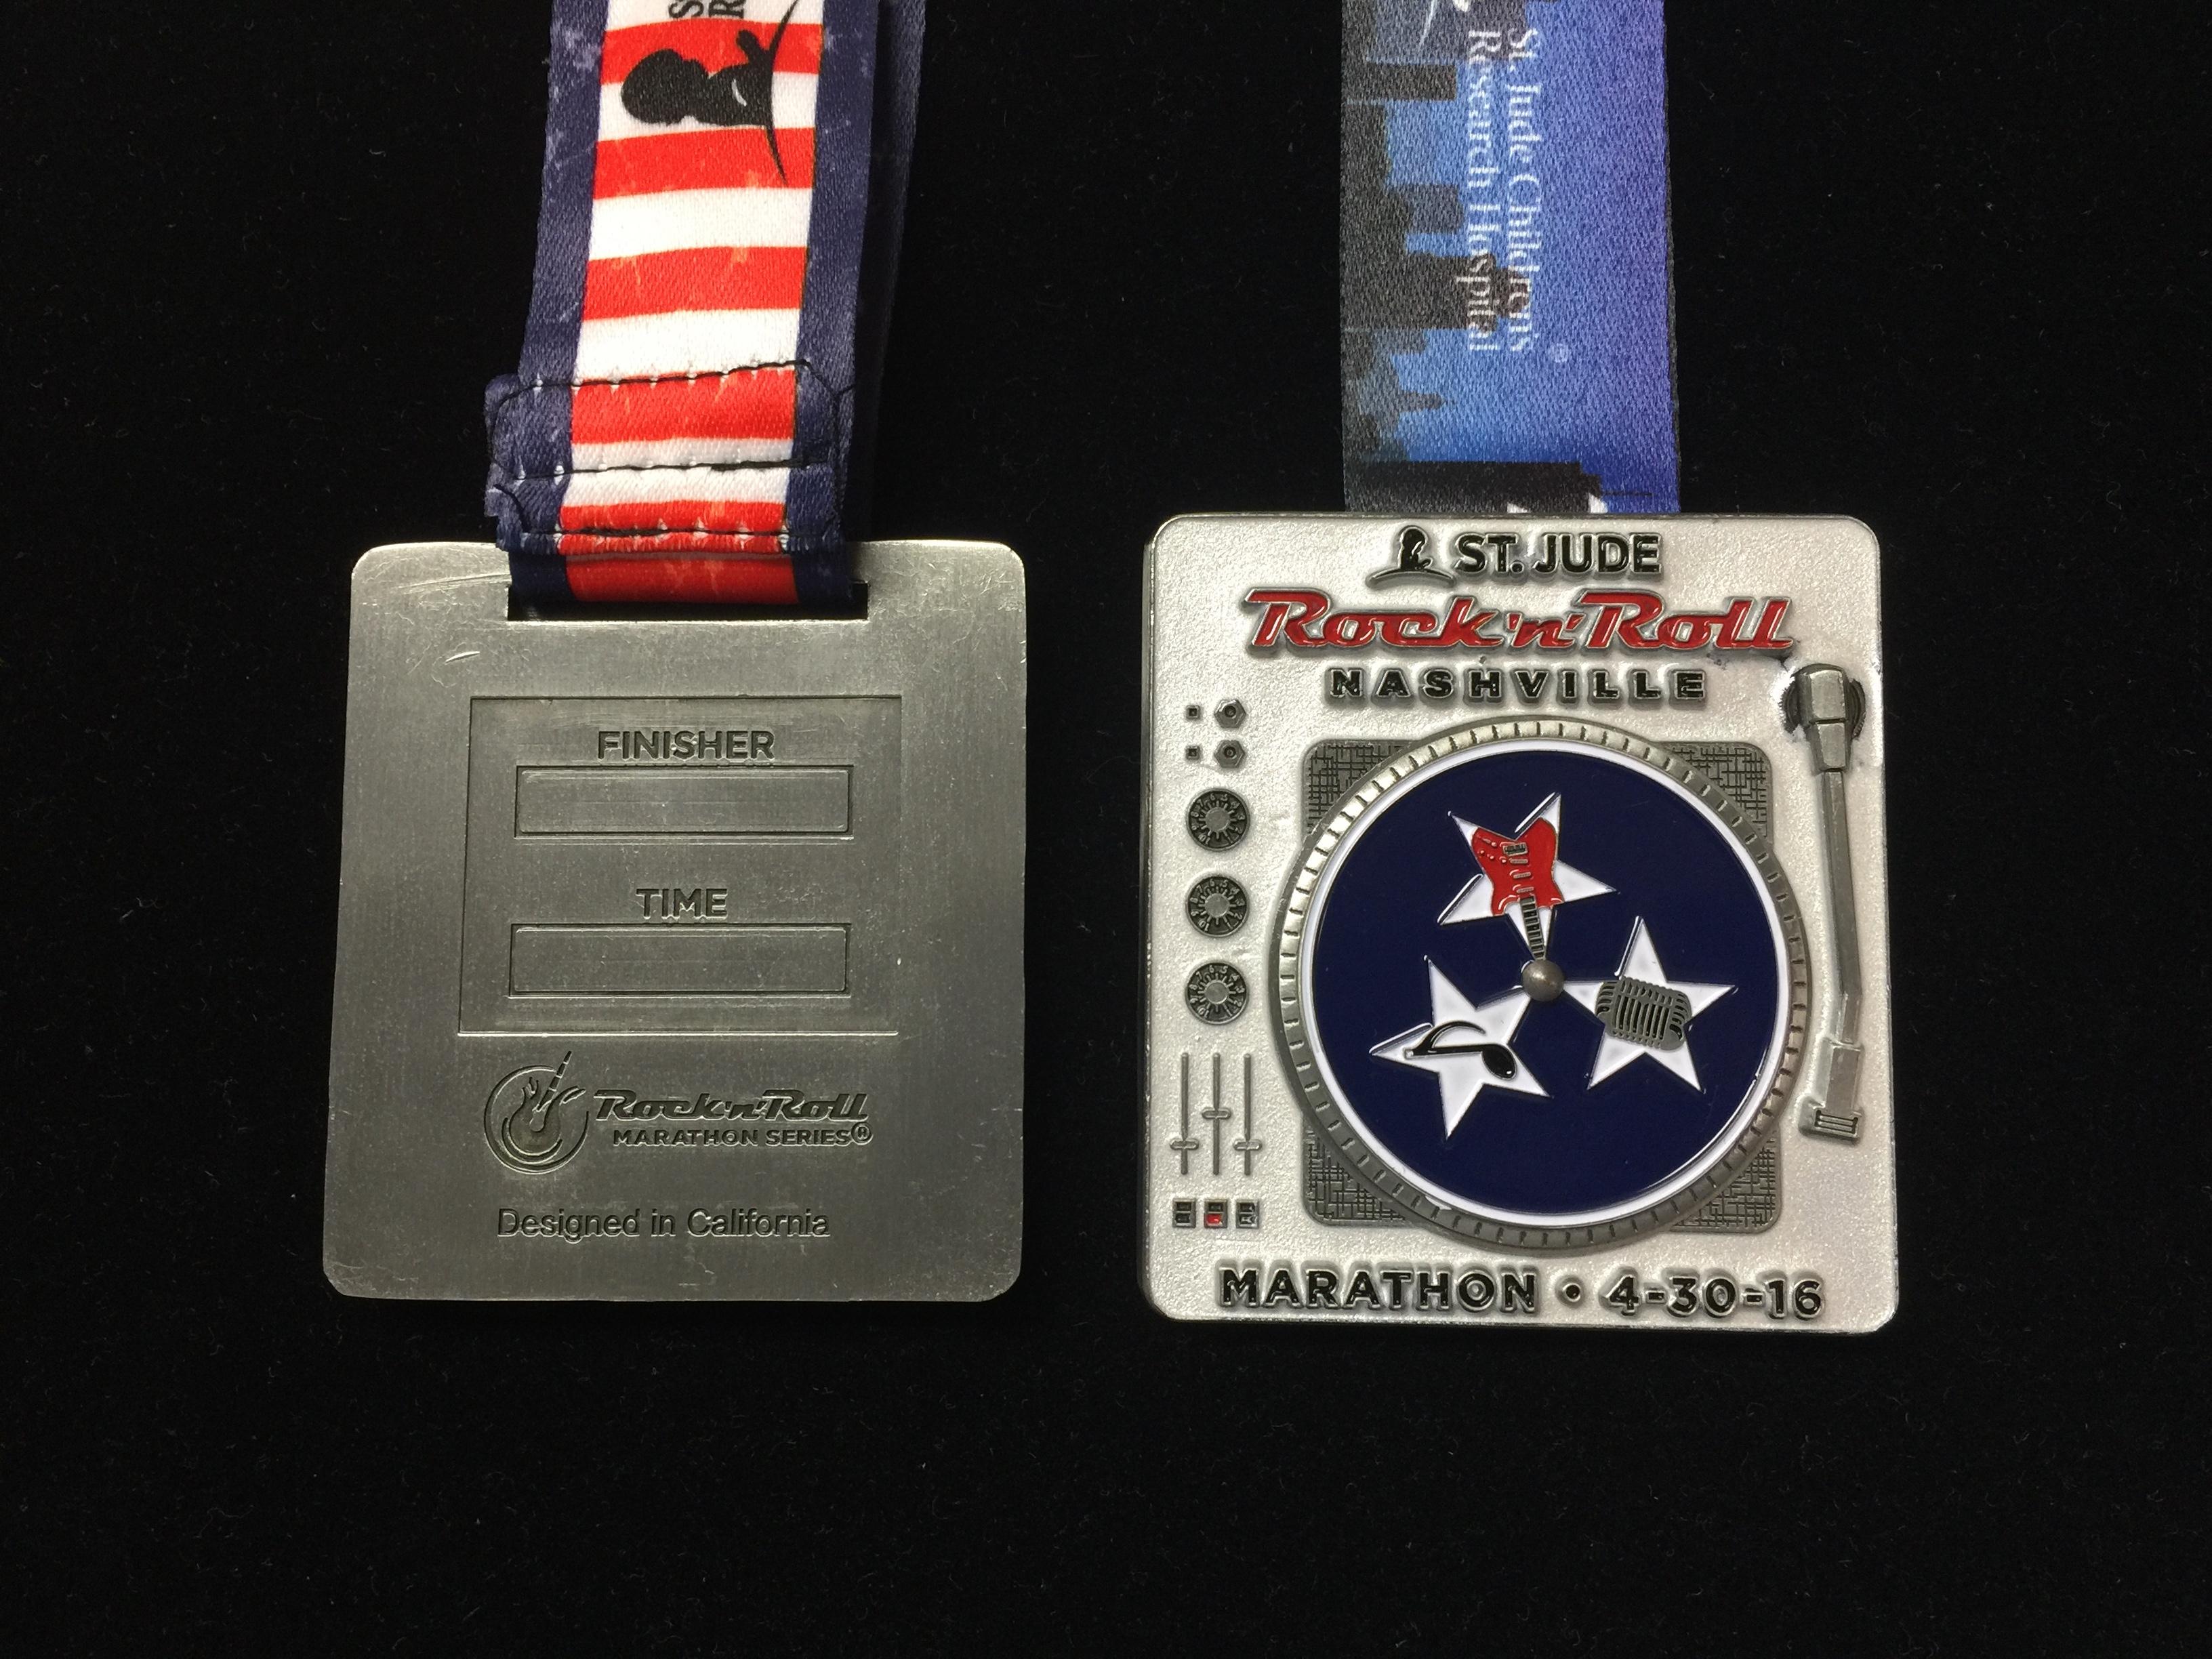 Nashville RNR Medal